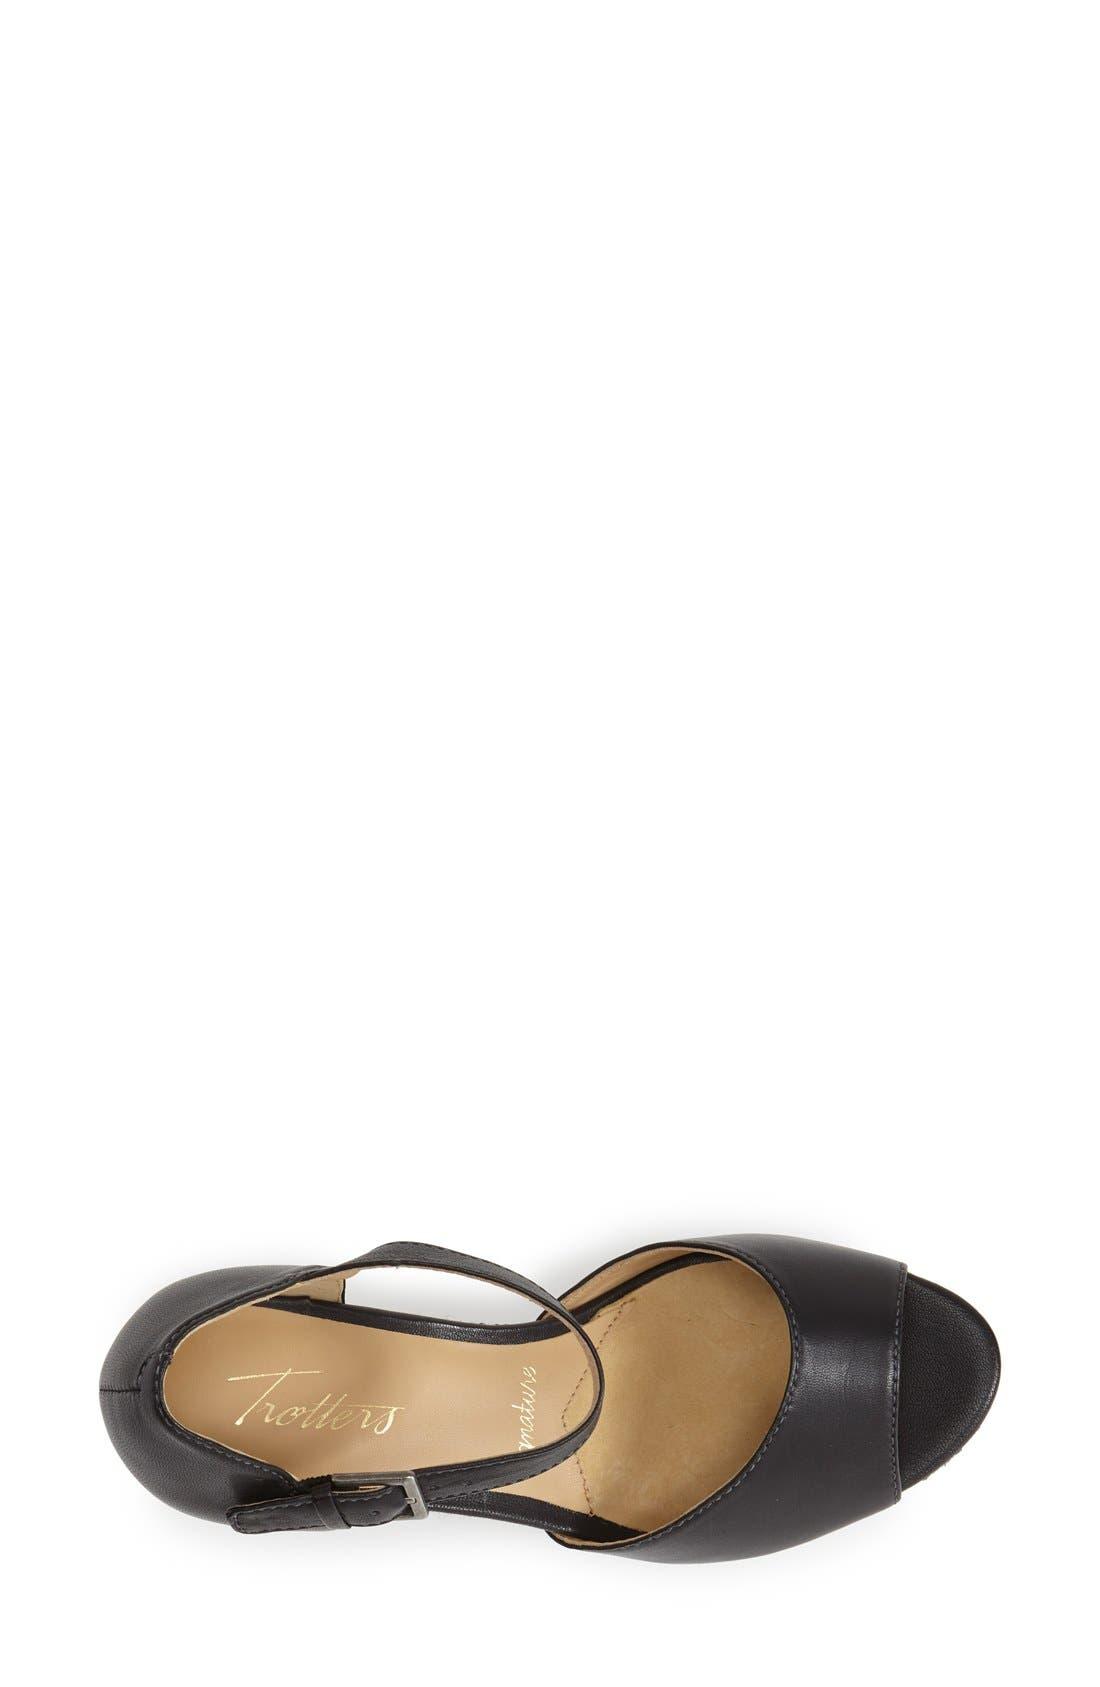 Alternate Image 3  - Trotters 'Amber' Wedge Sandal (Women)